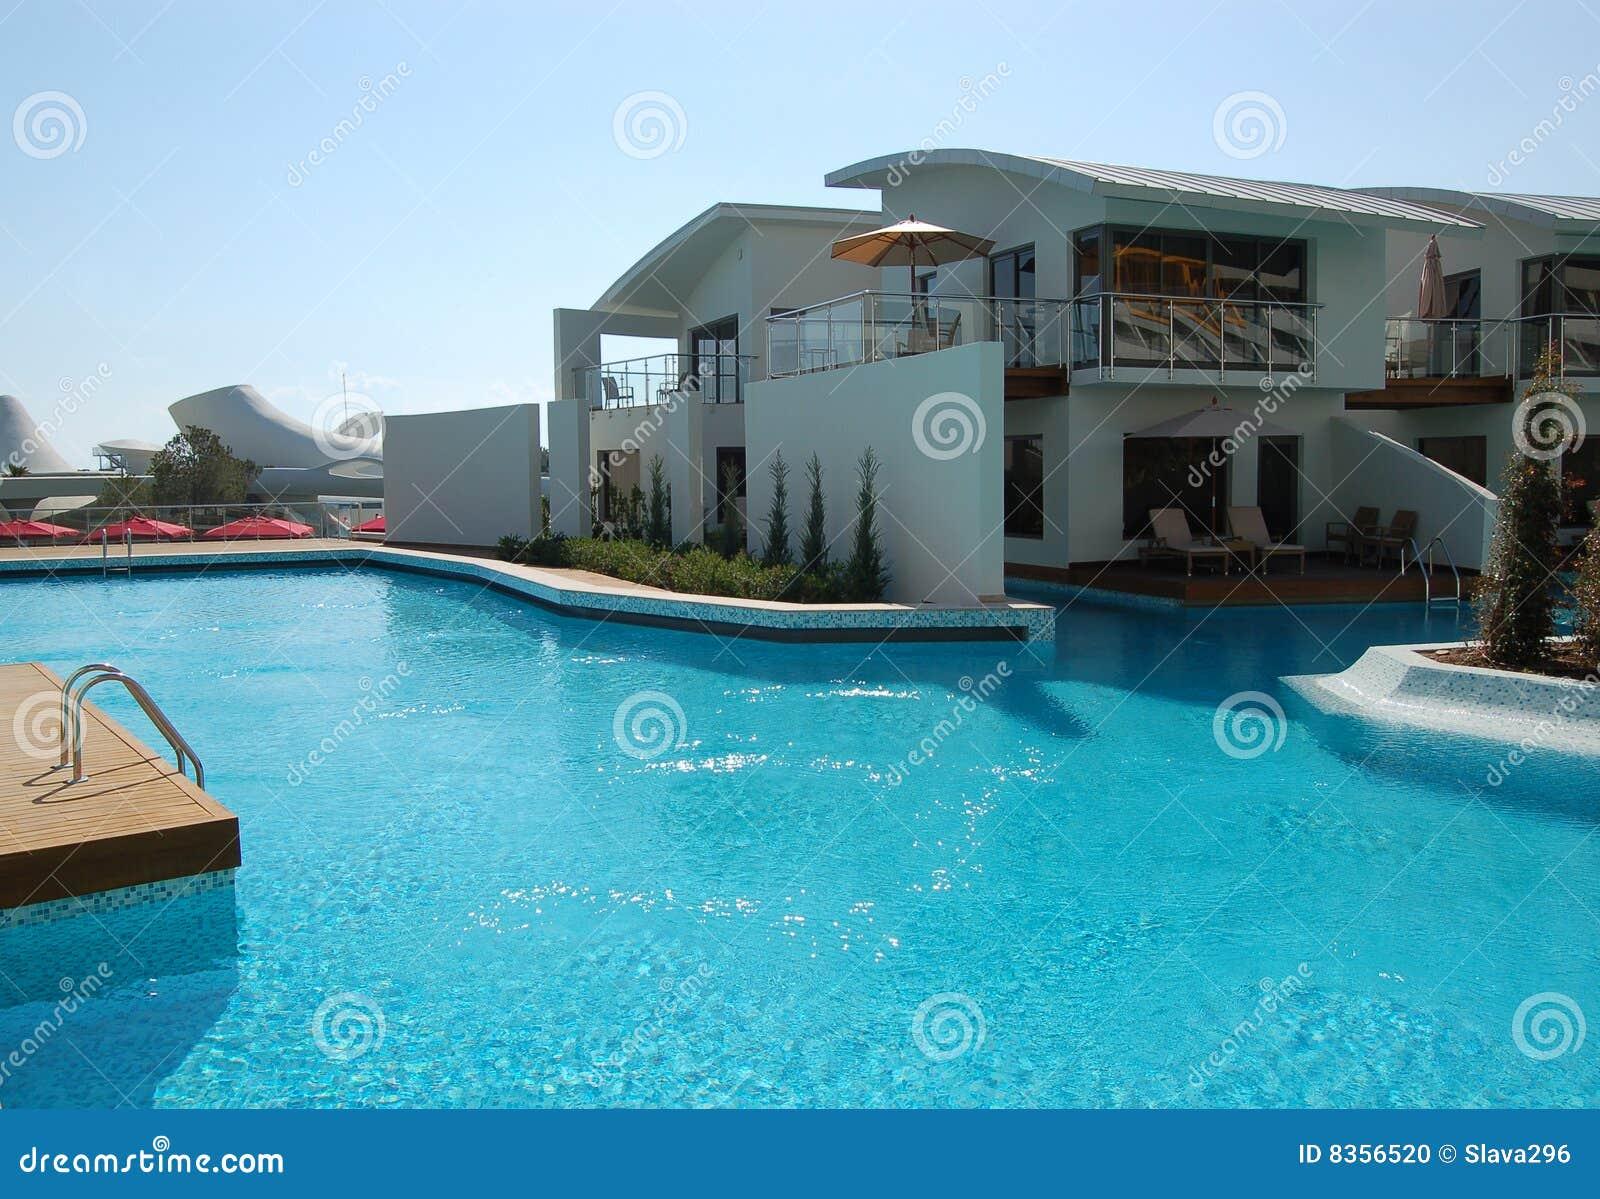 Fotos de casas con piscina dise os arquitect nicos for Imagenes de piscinas bonitas